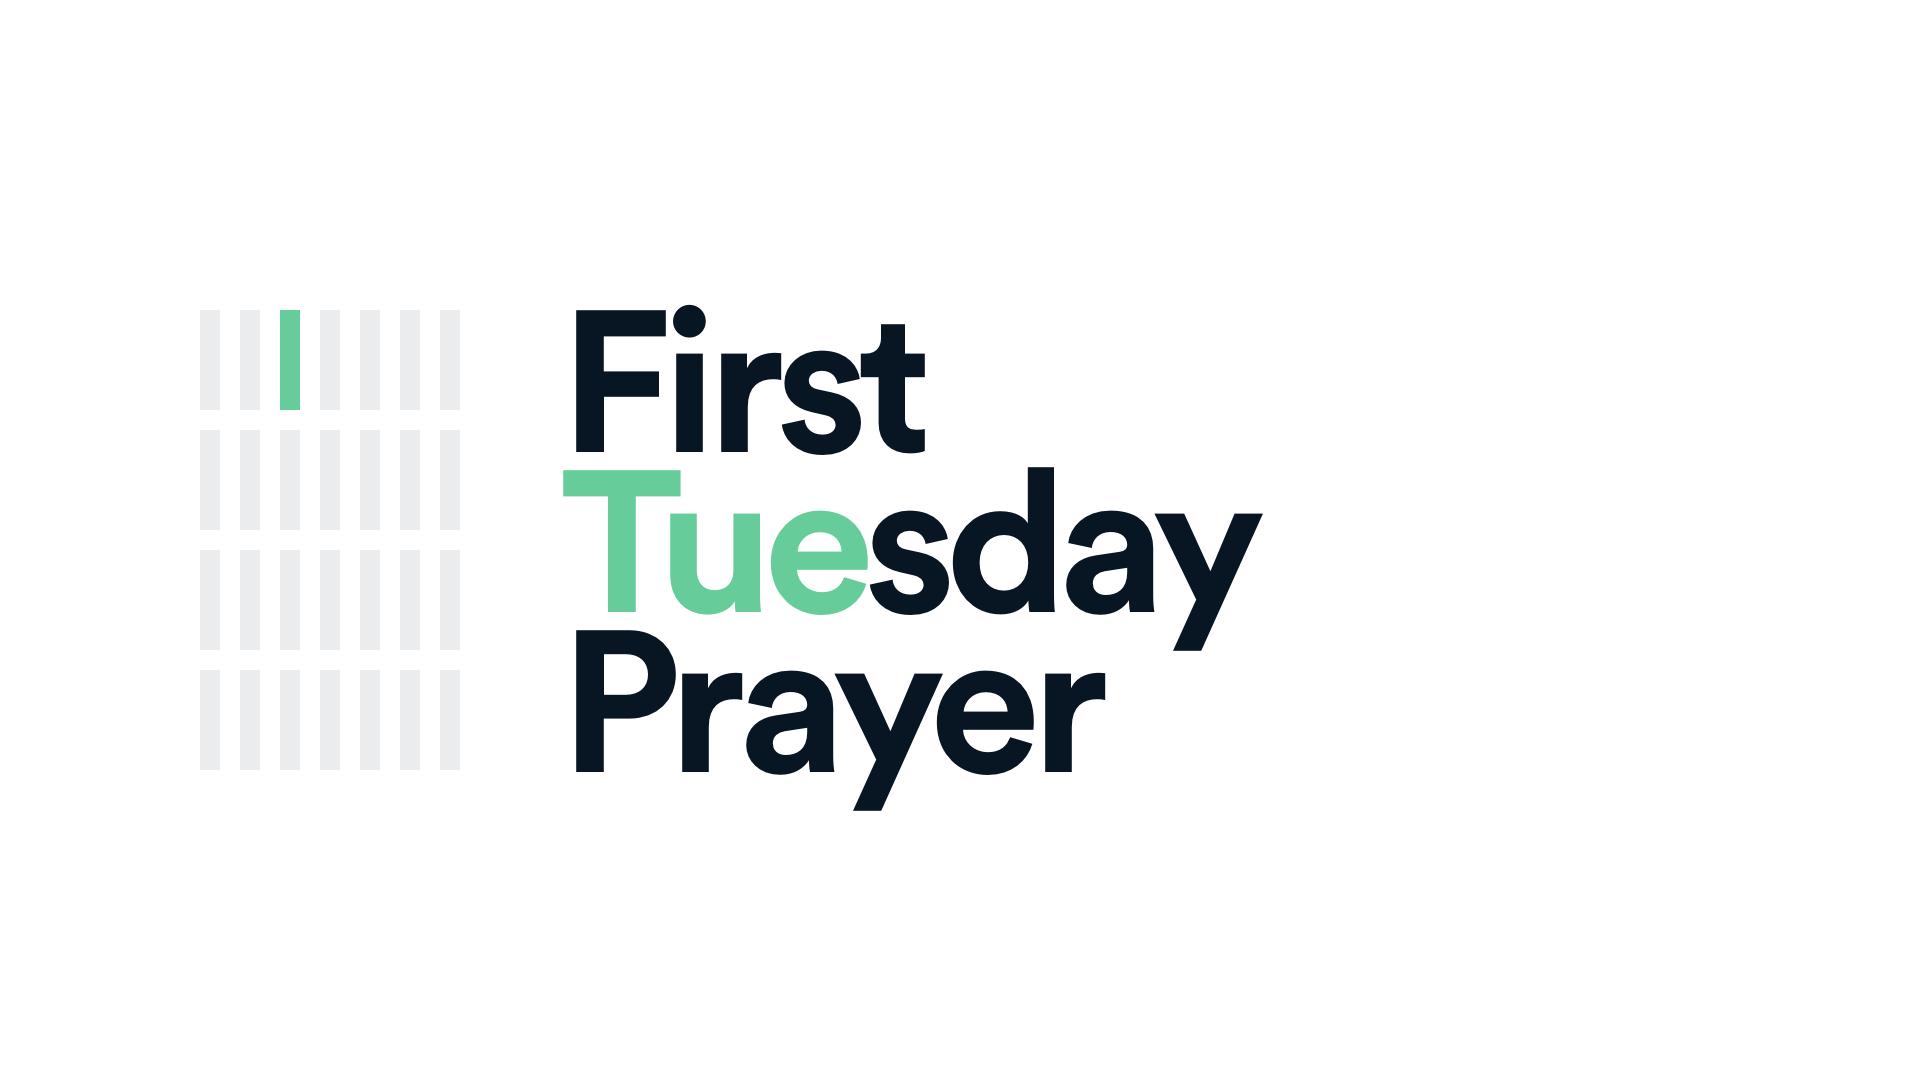 18-11-18-Prayer-HD.png